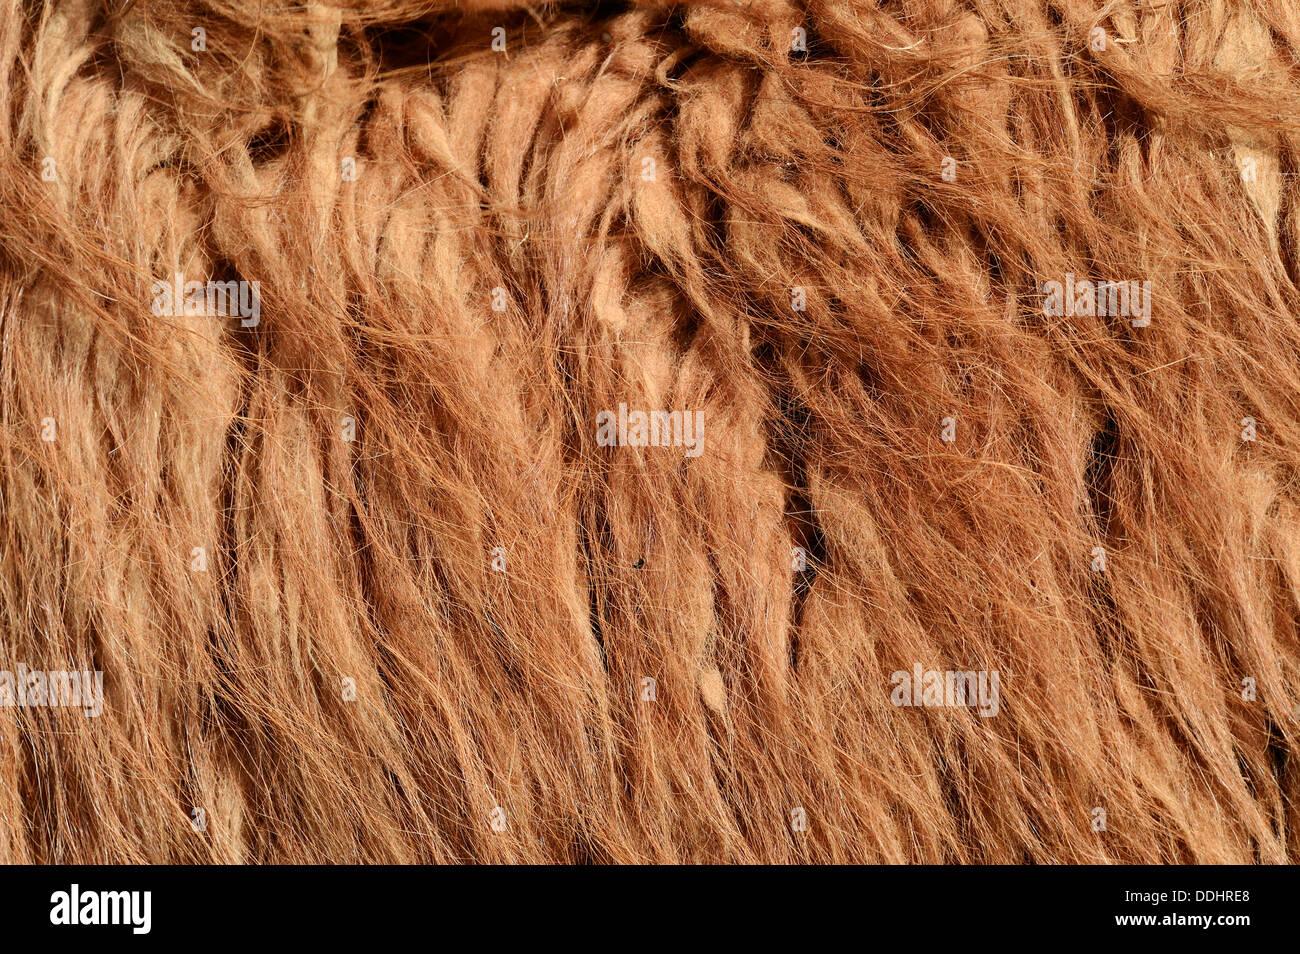 Llama (Lama glama), fur detail, native to South America, captive - Stock Image